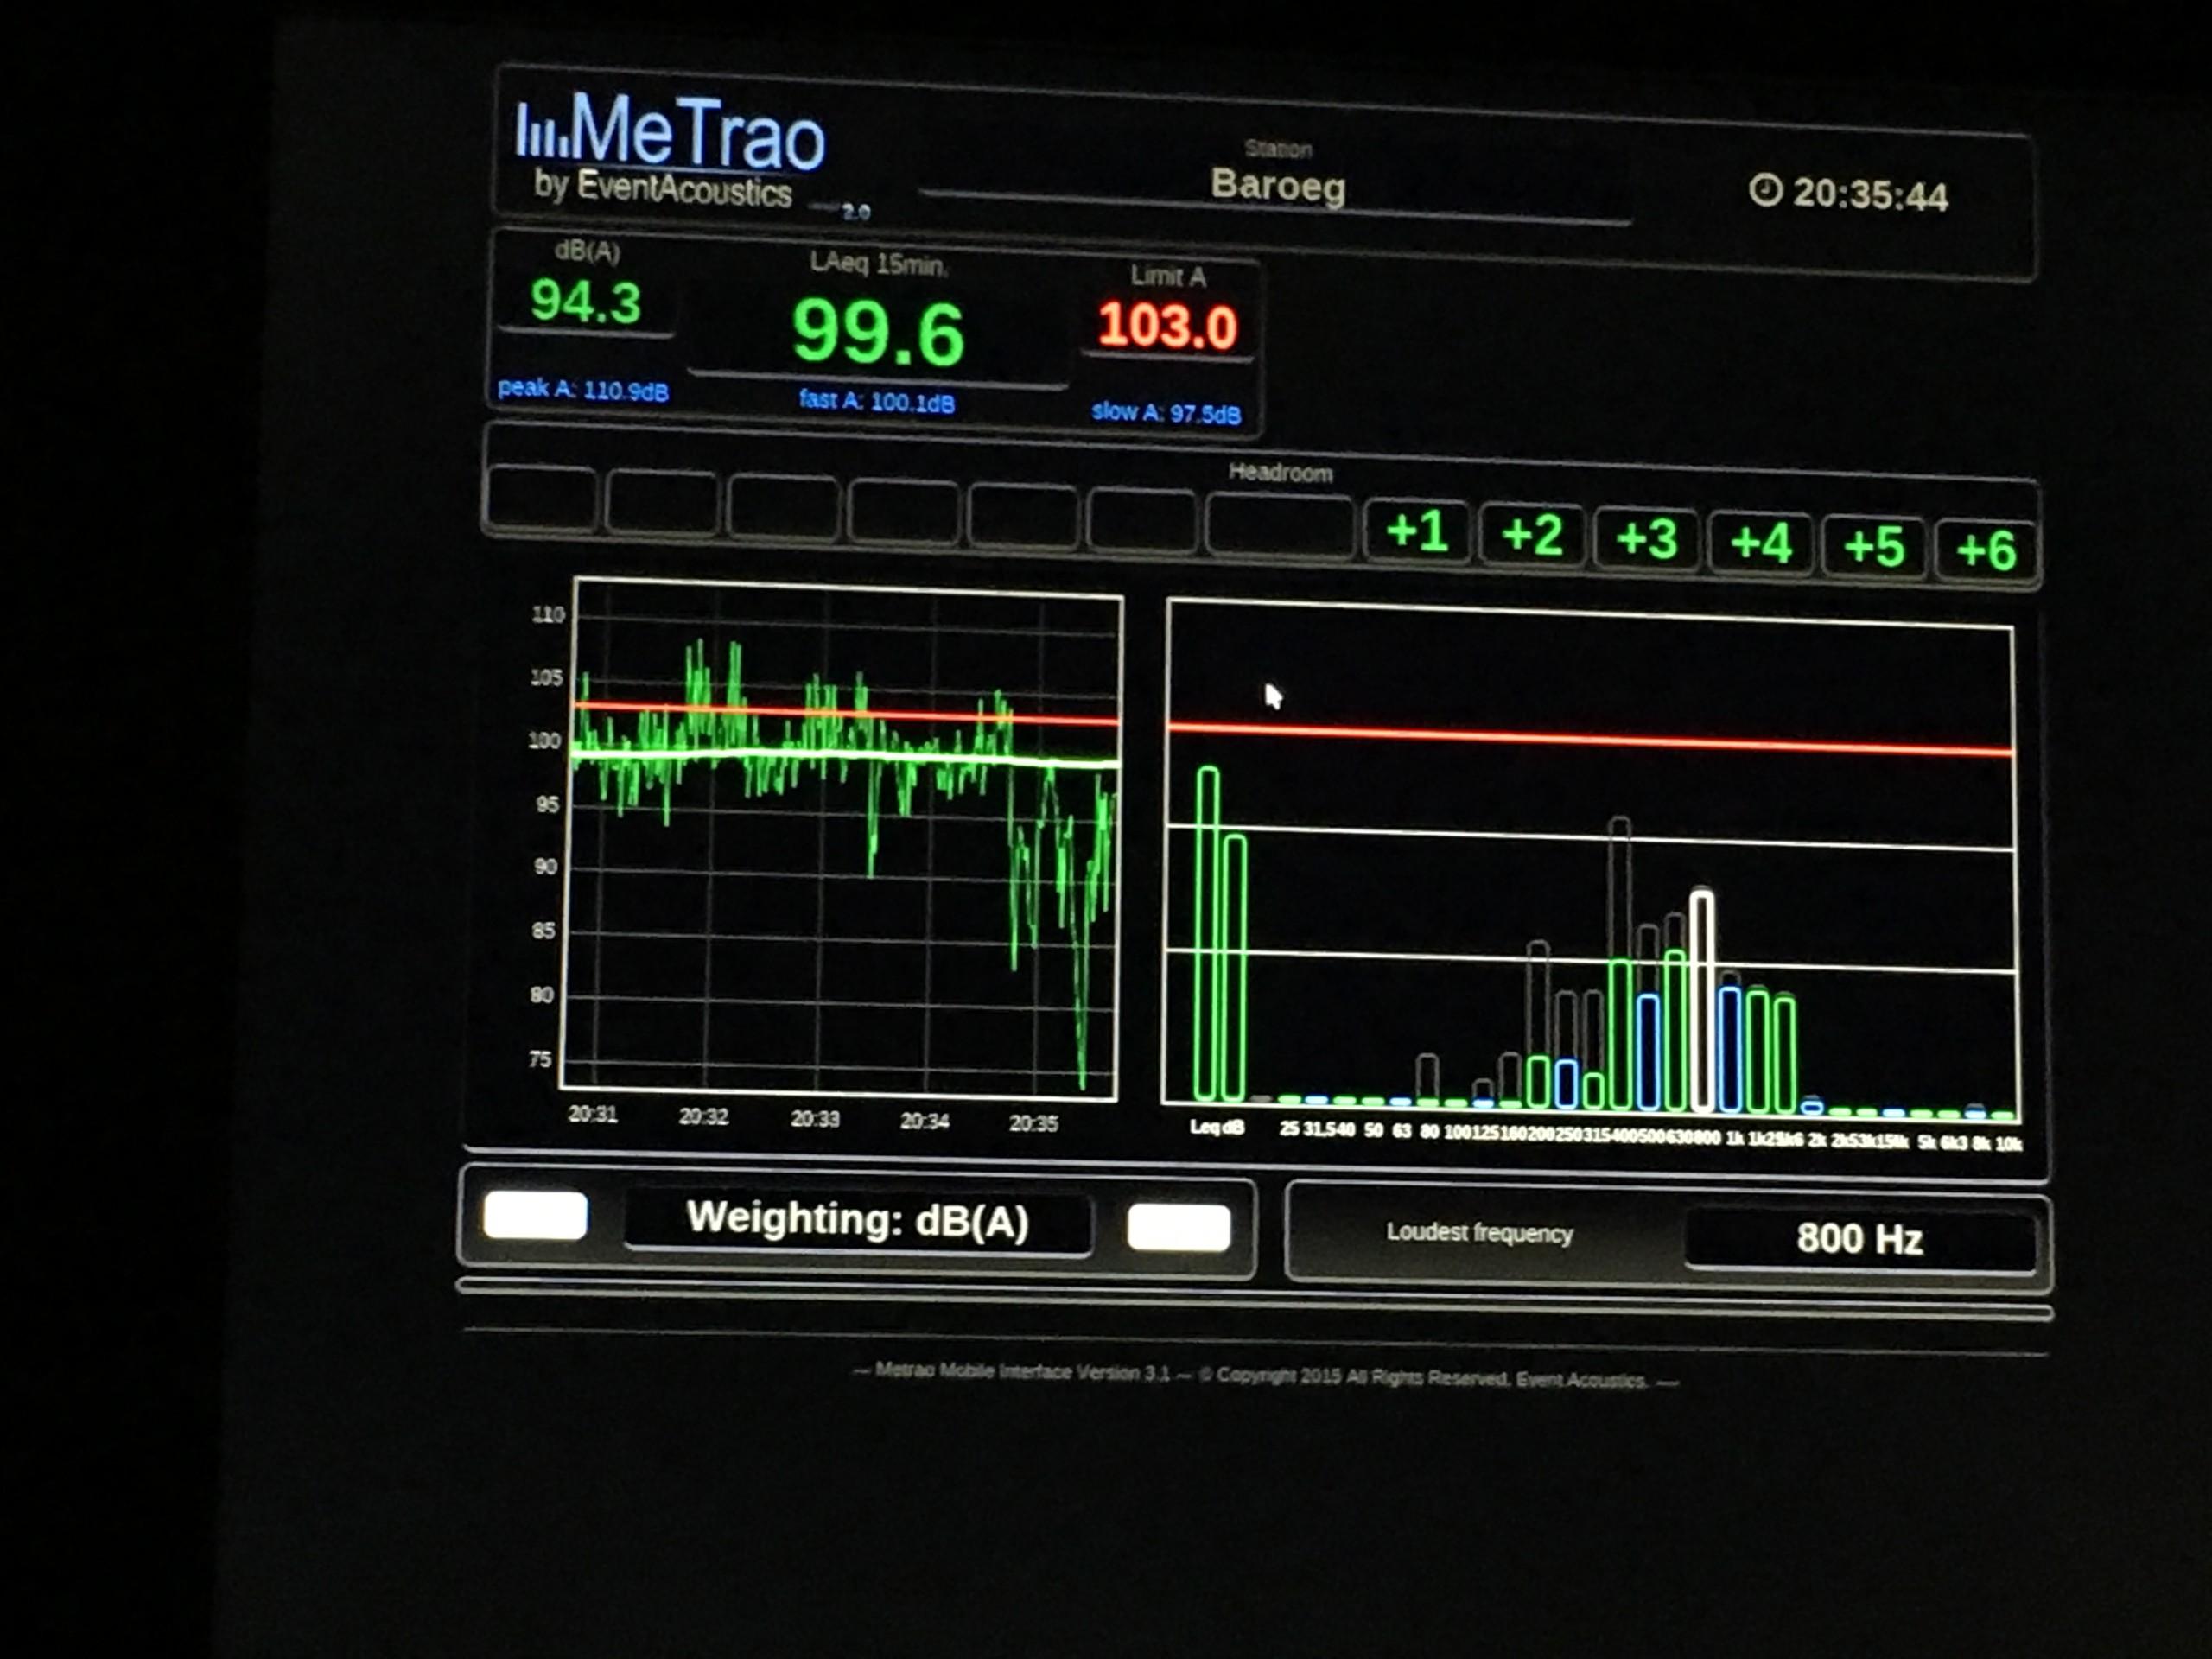 audio engineering recent work bands voodoo circle measure